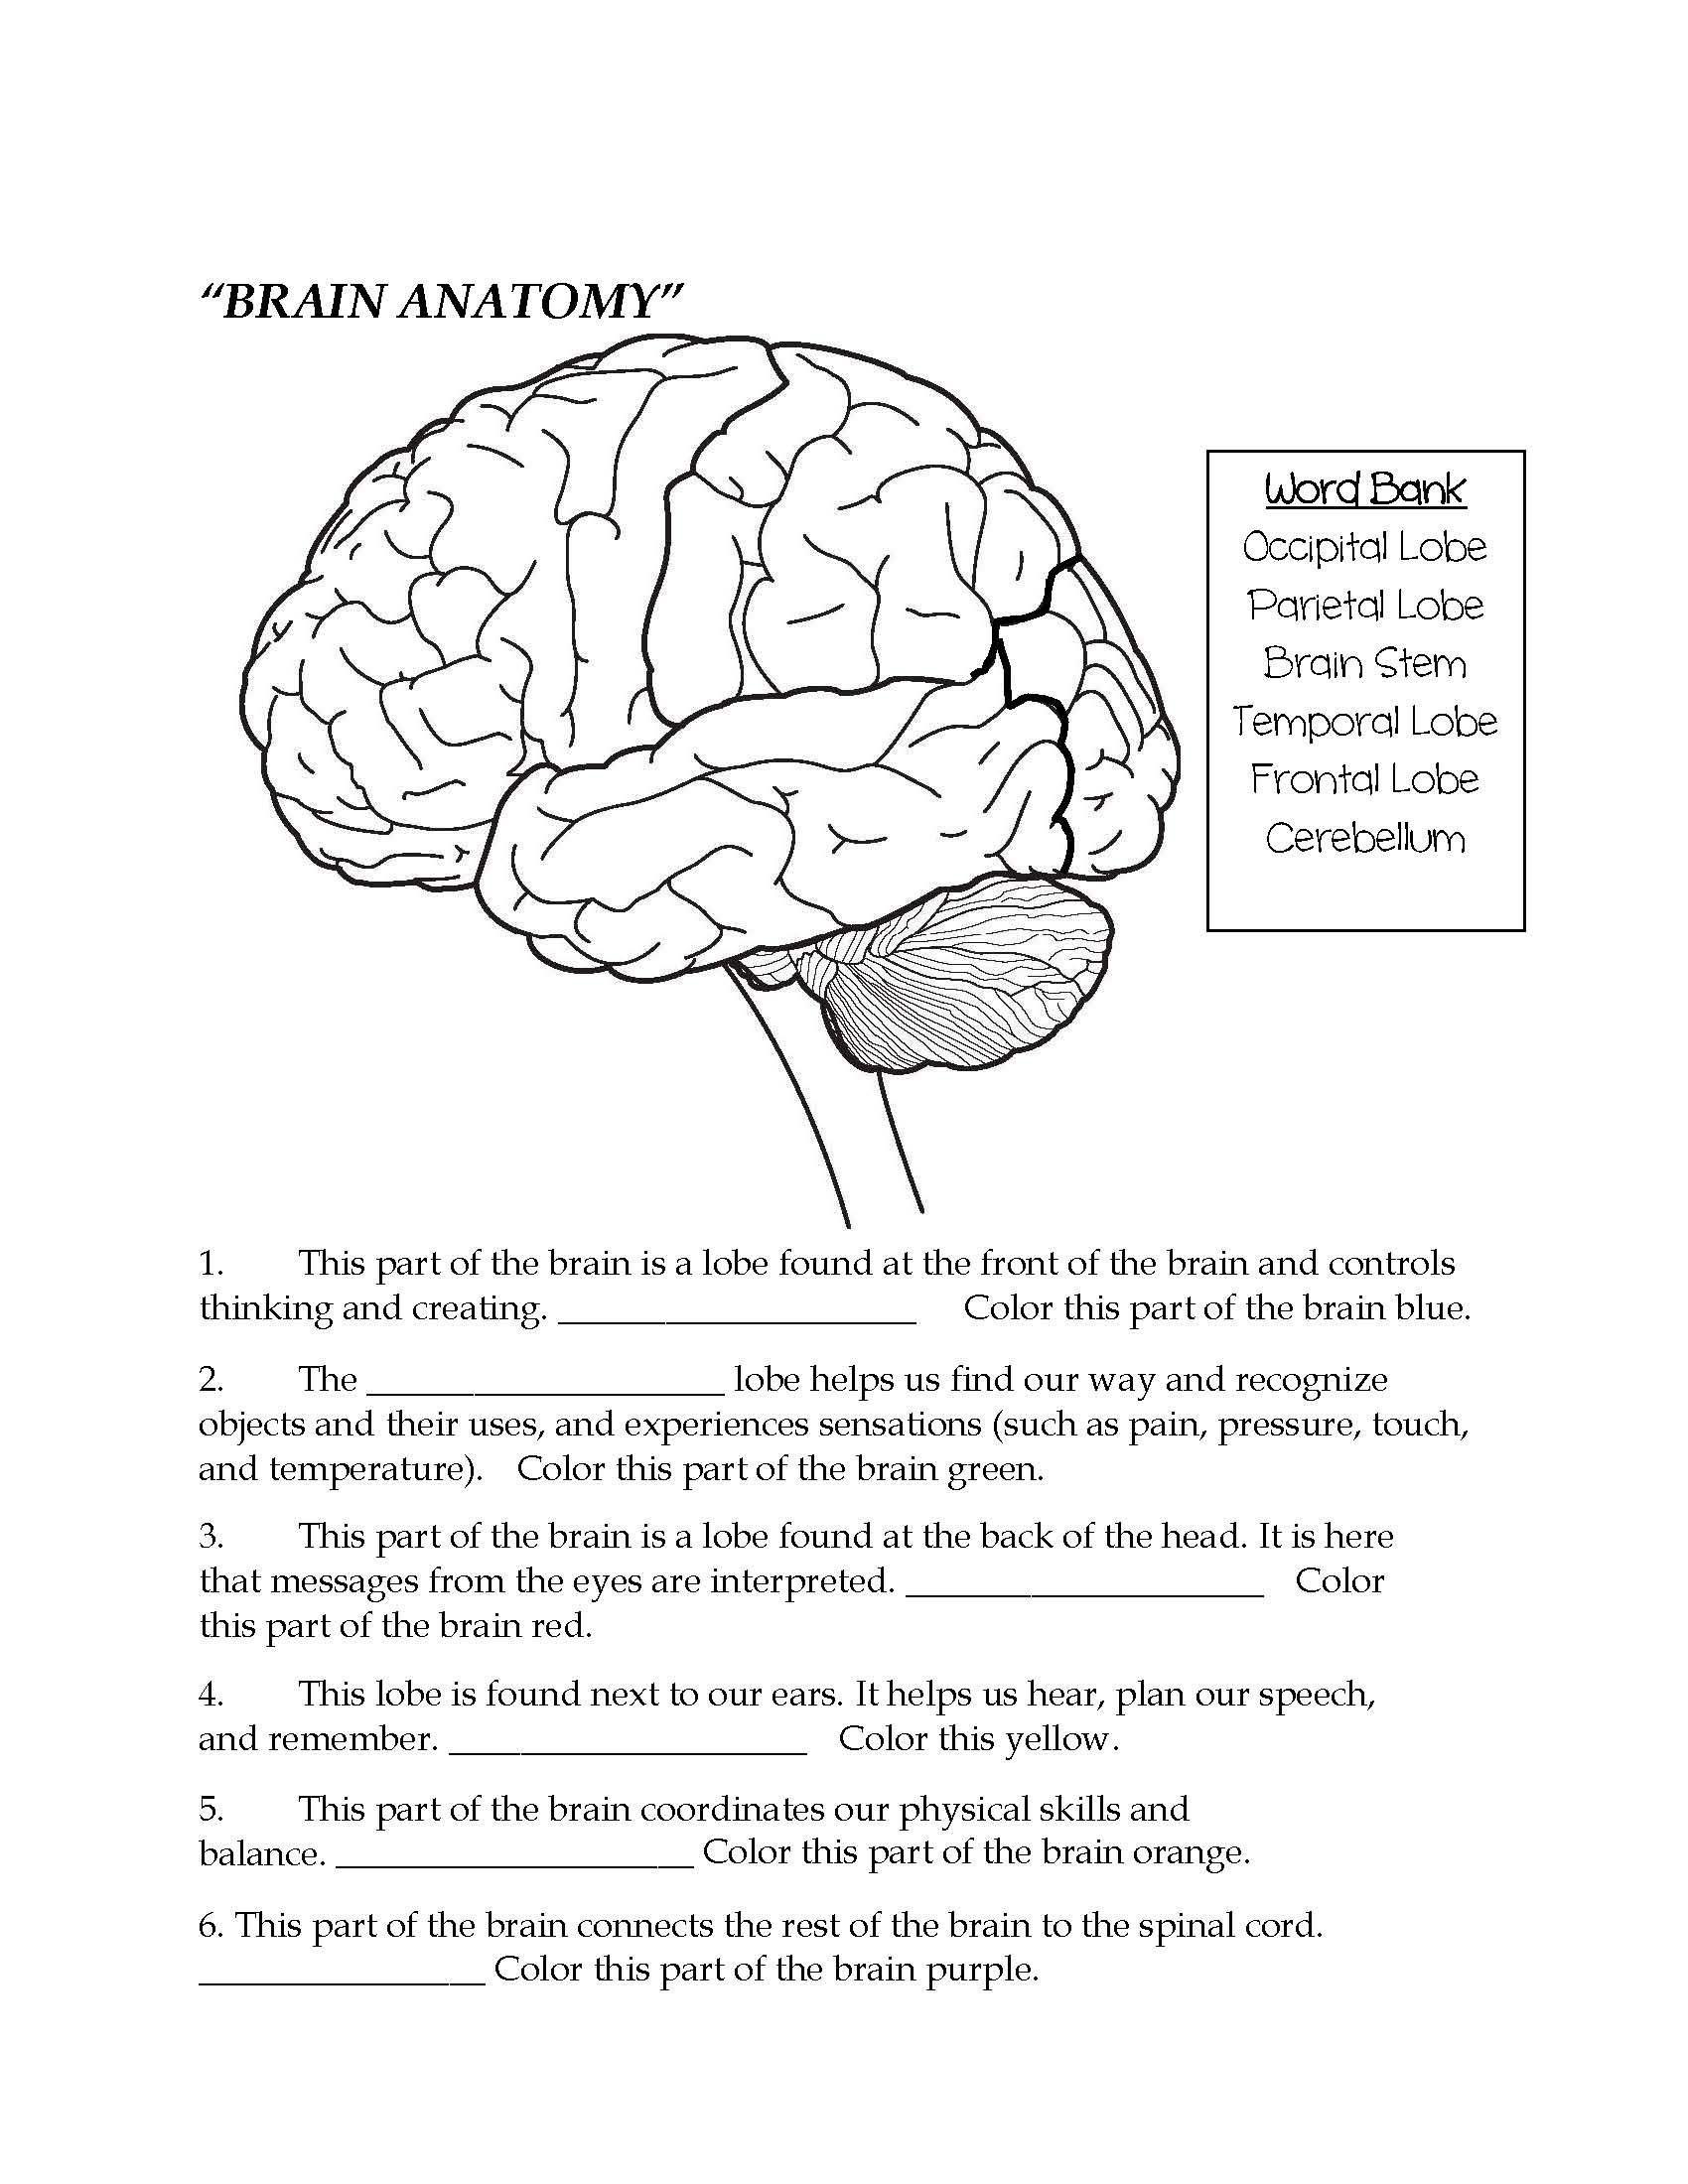 Pin By Sherlundra Ellis On Brain Anatomy